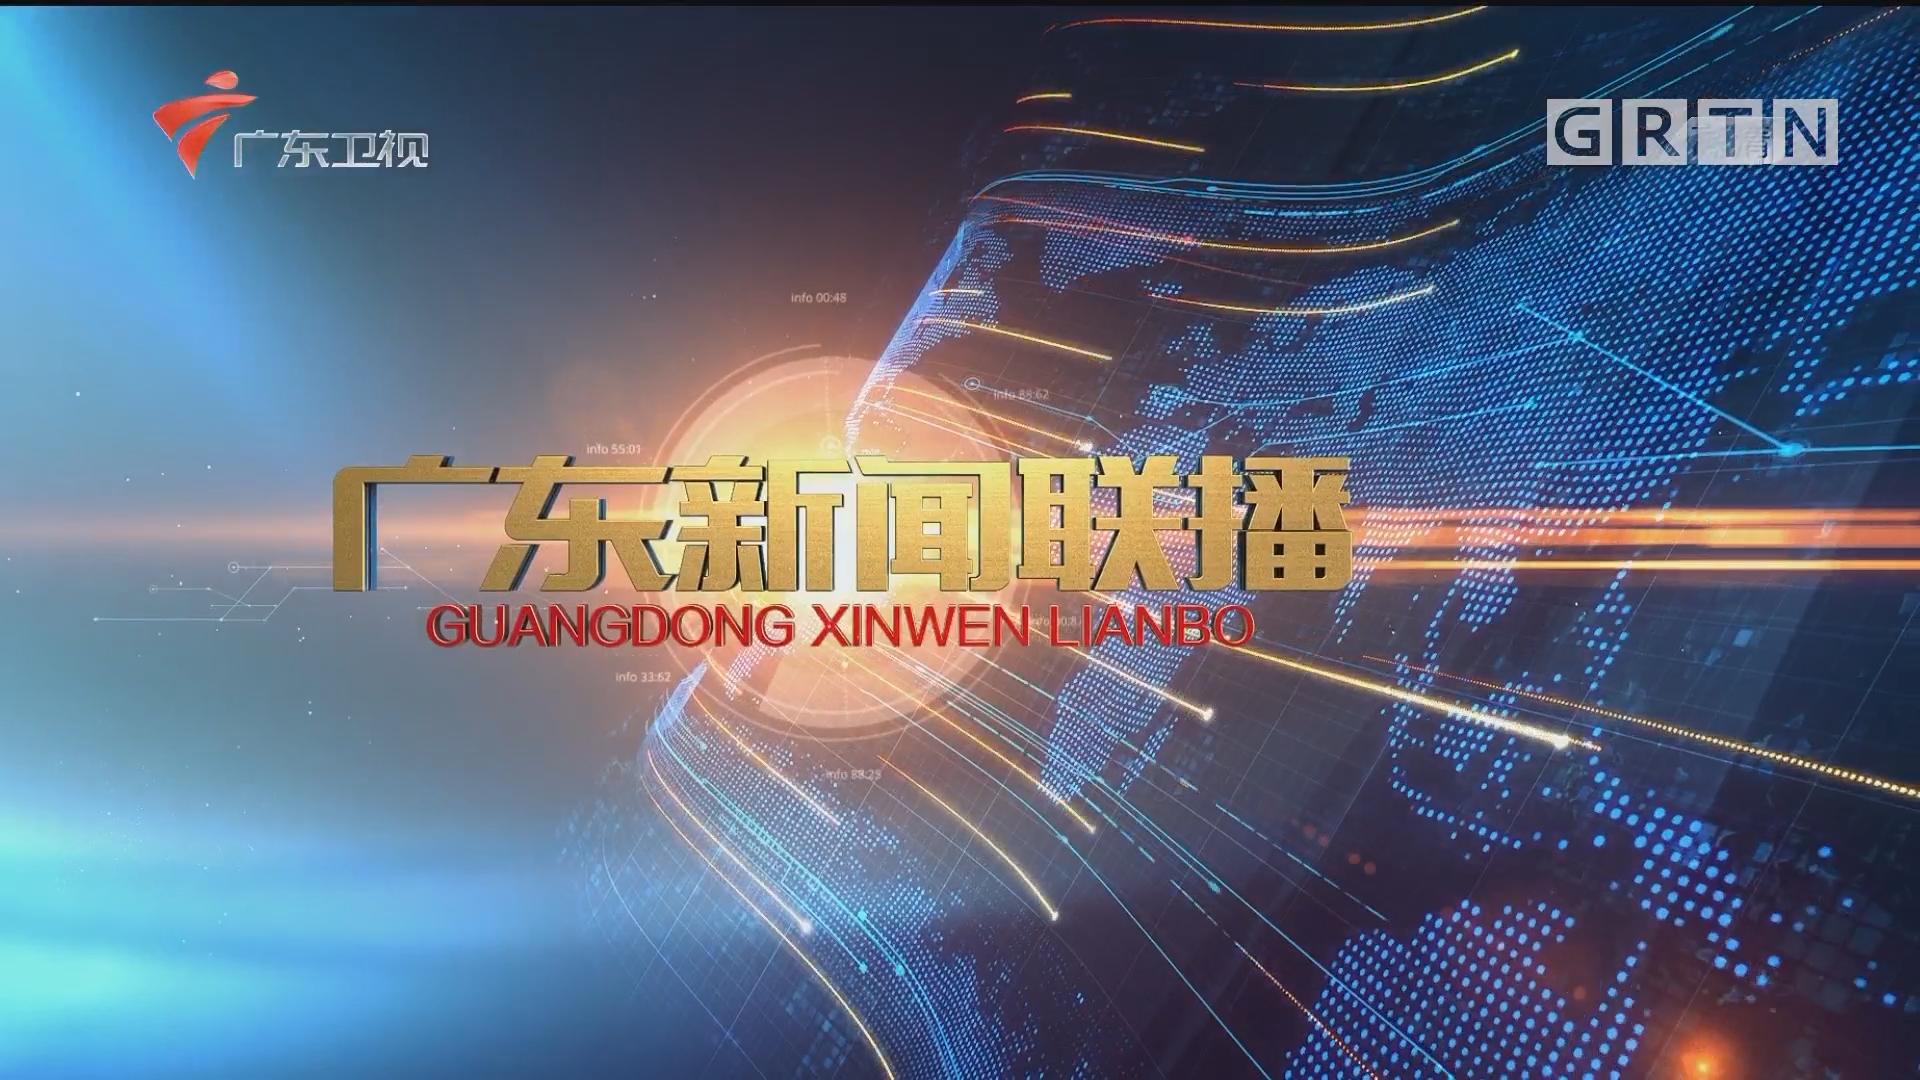 [HD][2017-11-16]广东新闻联播:第十九届高交会在深圳开幕 李希万钢周济马兴瑞出席